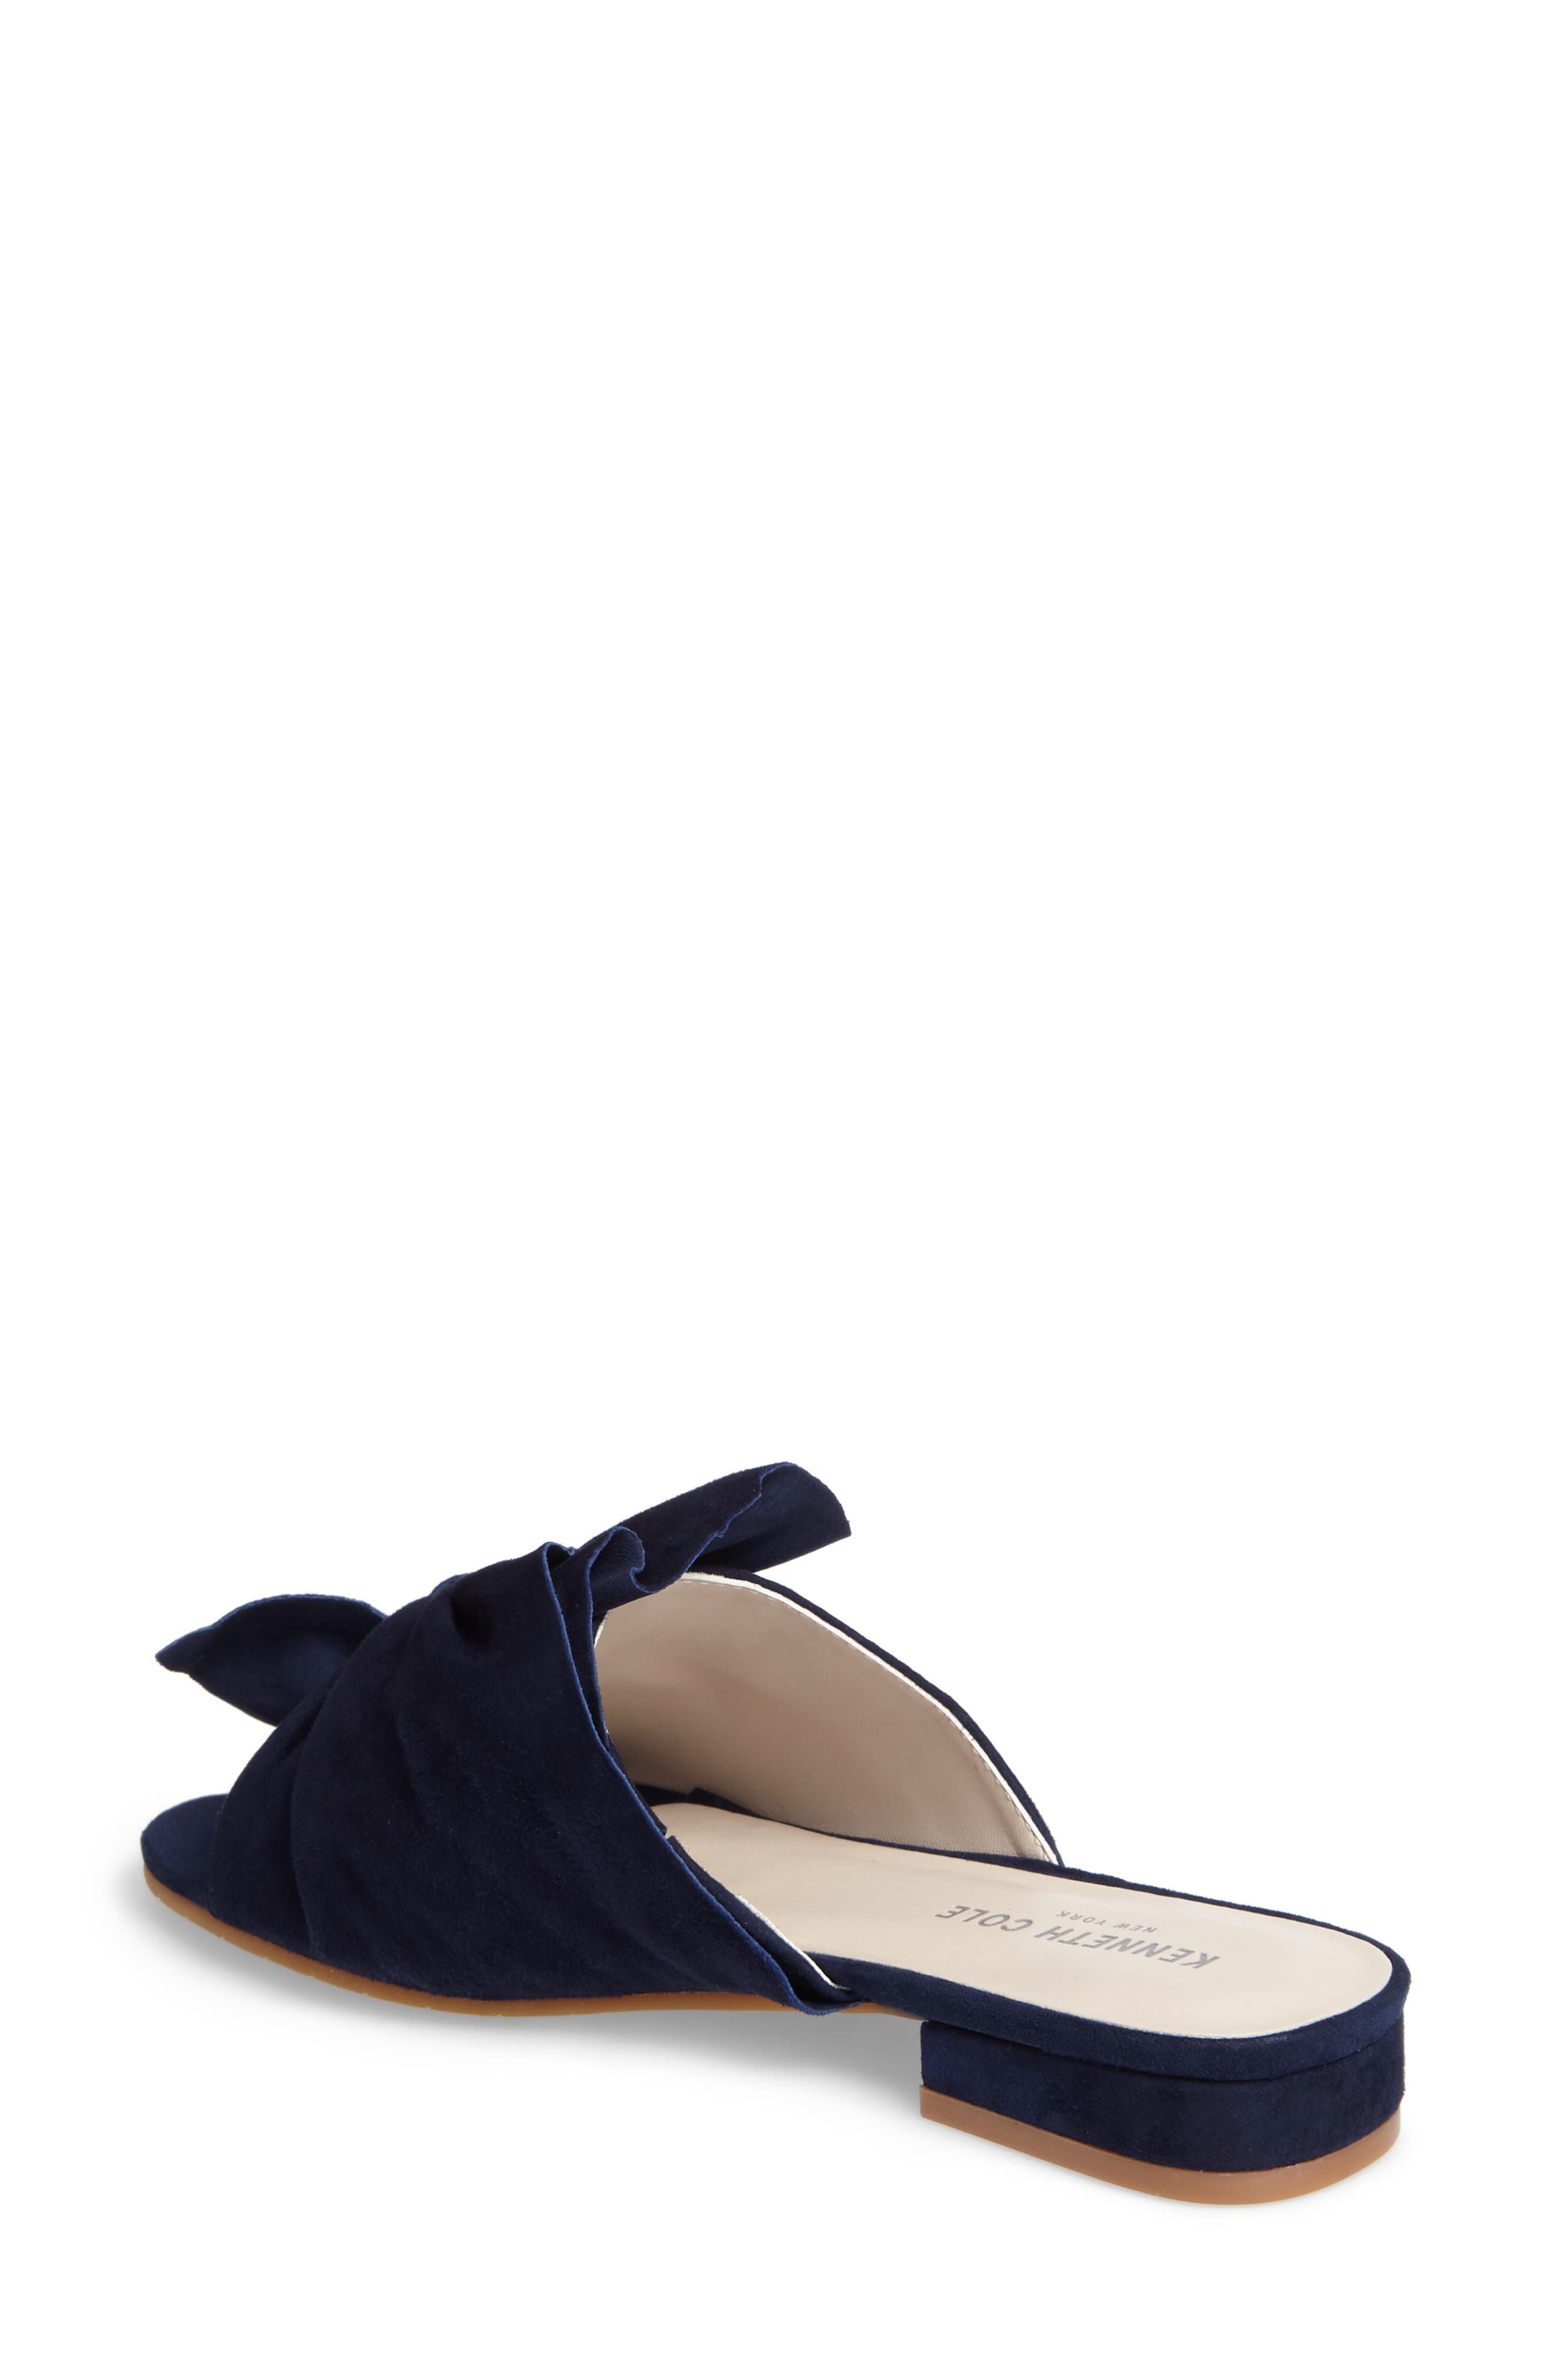 Violet Slide Sandal,                             Alternate thumbnail 9, color,